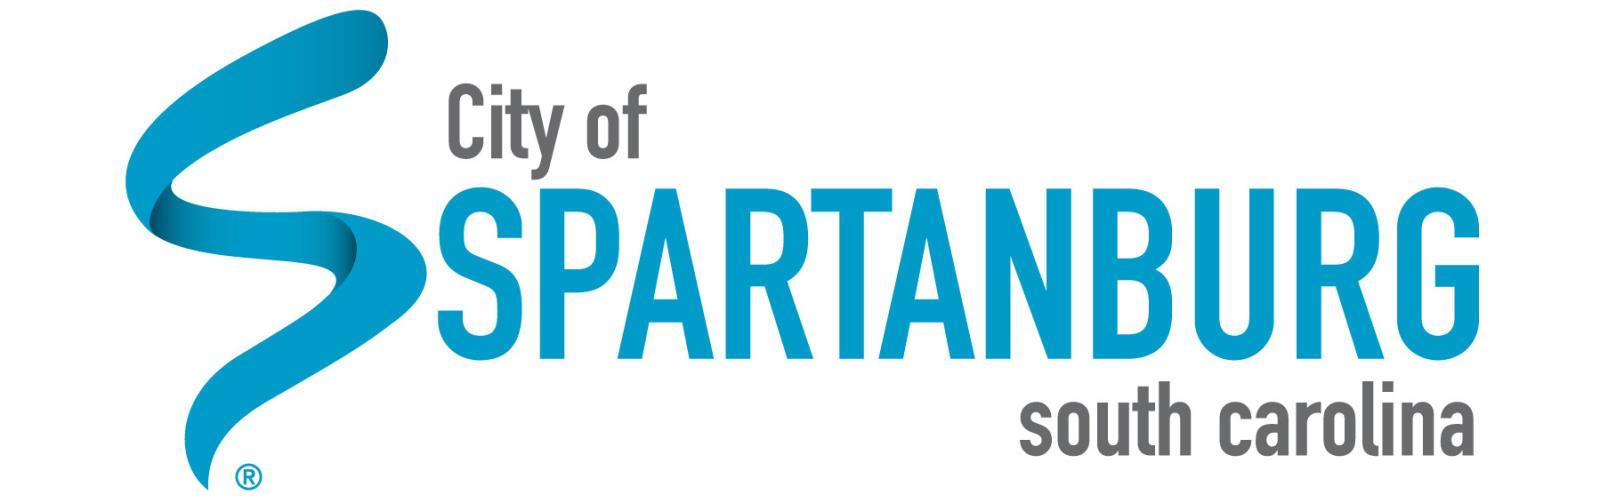 CityofSptbg_logo_horizontal.jpg